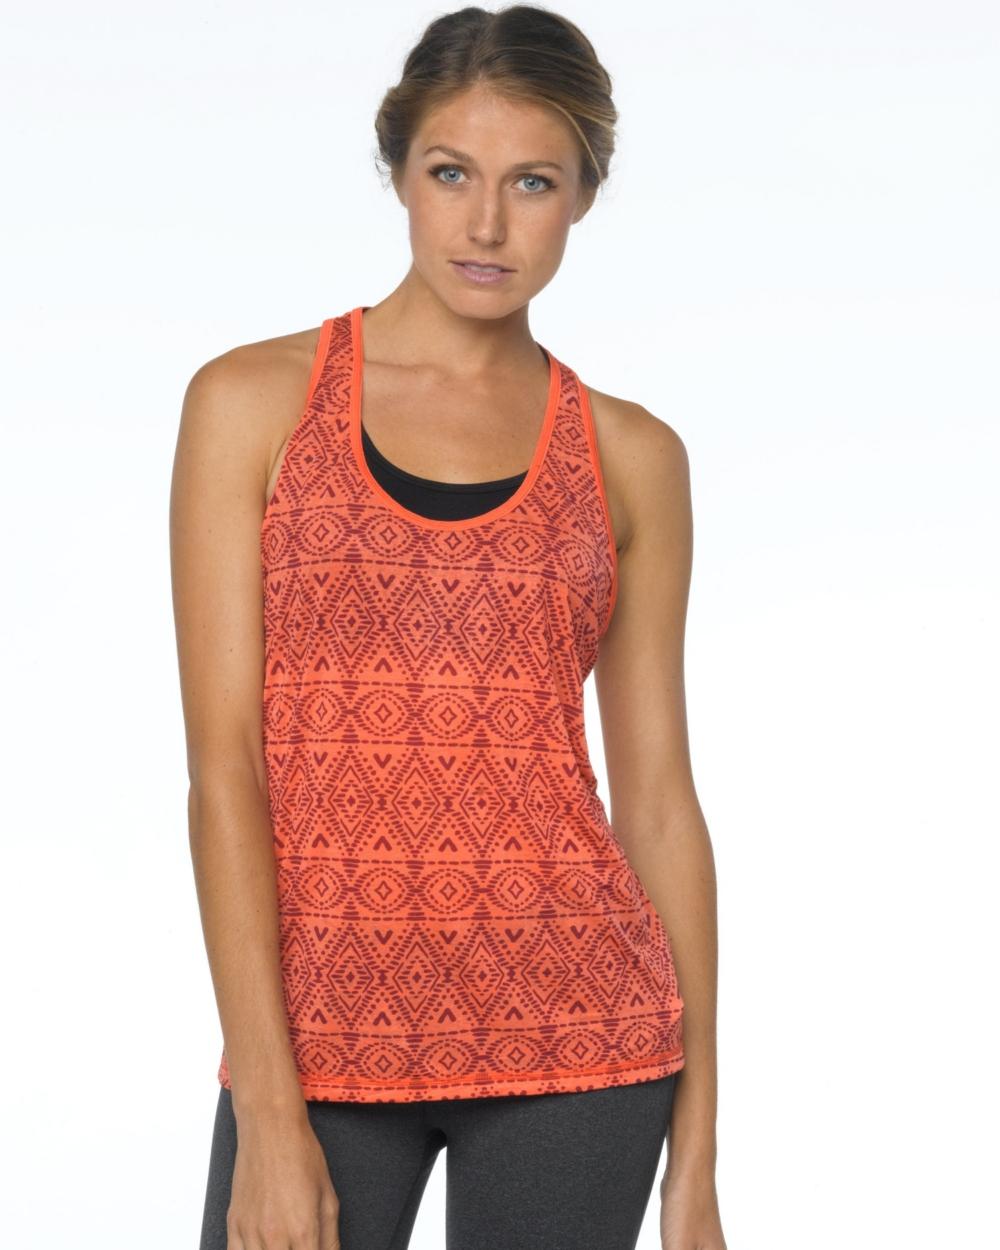 2015 Prana Activewear Luca Tank in Neon Orange